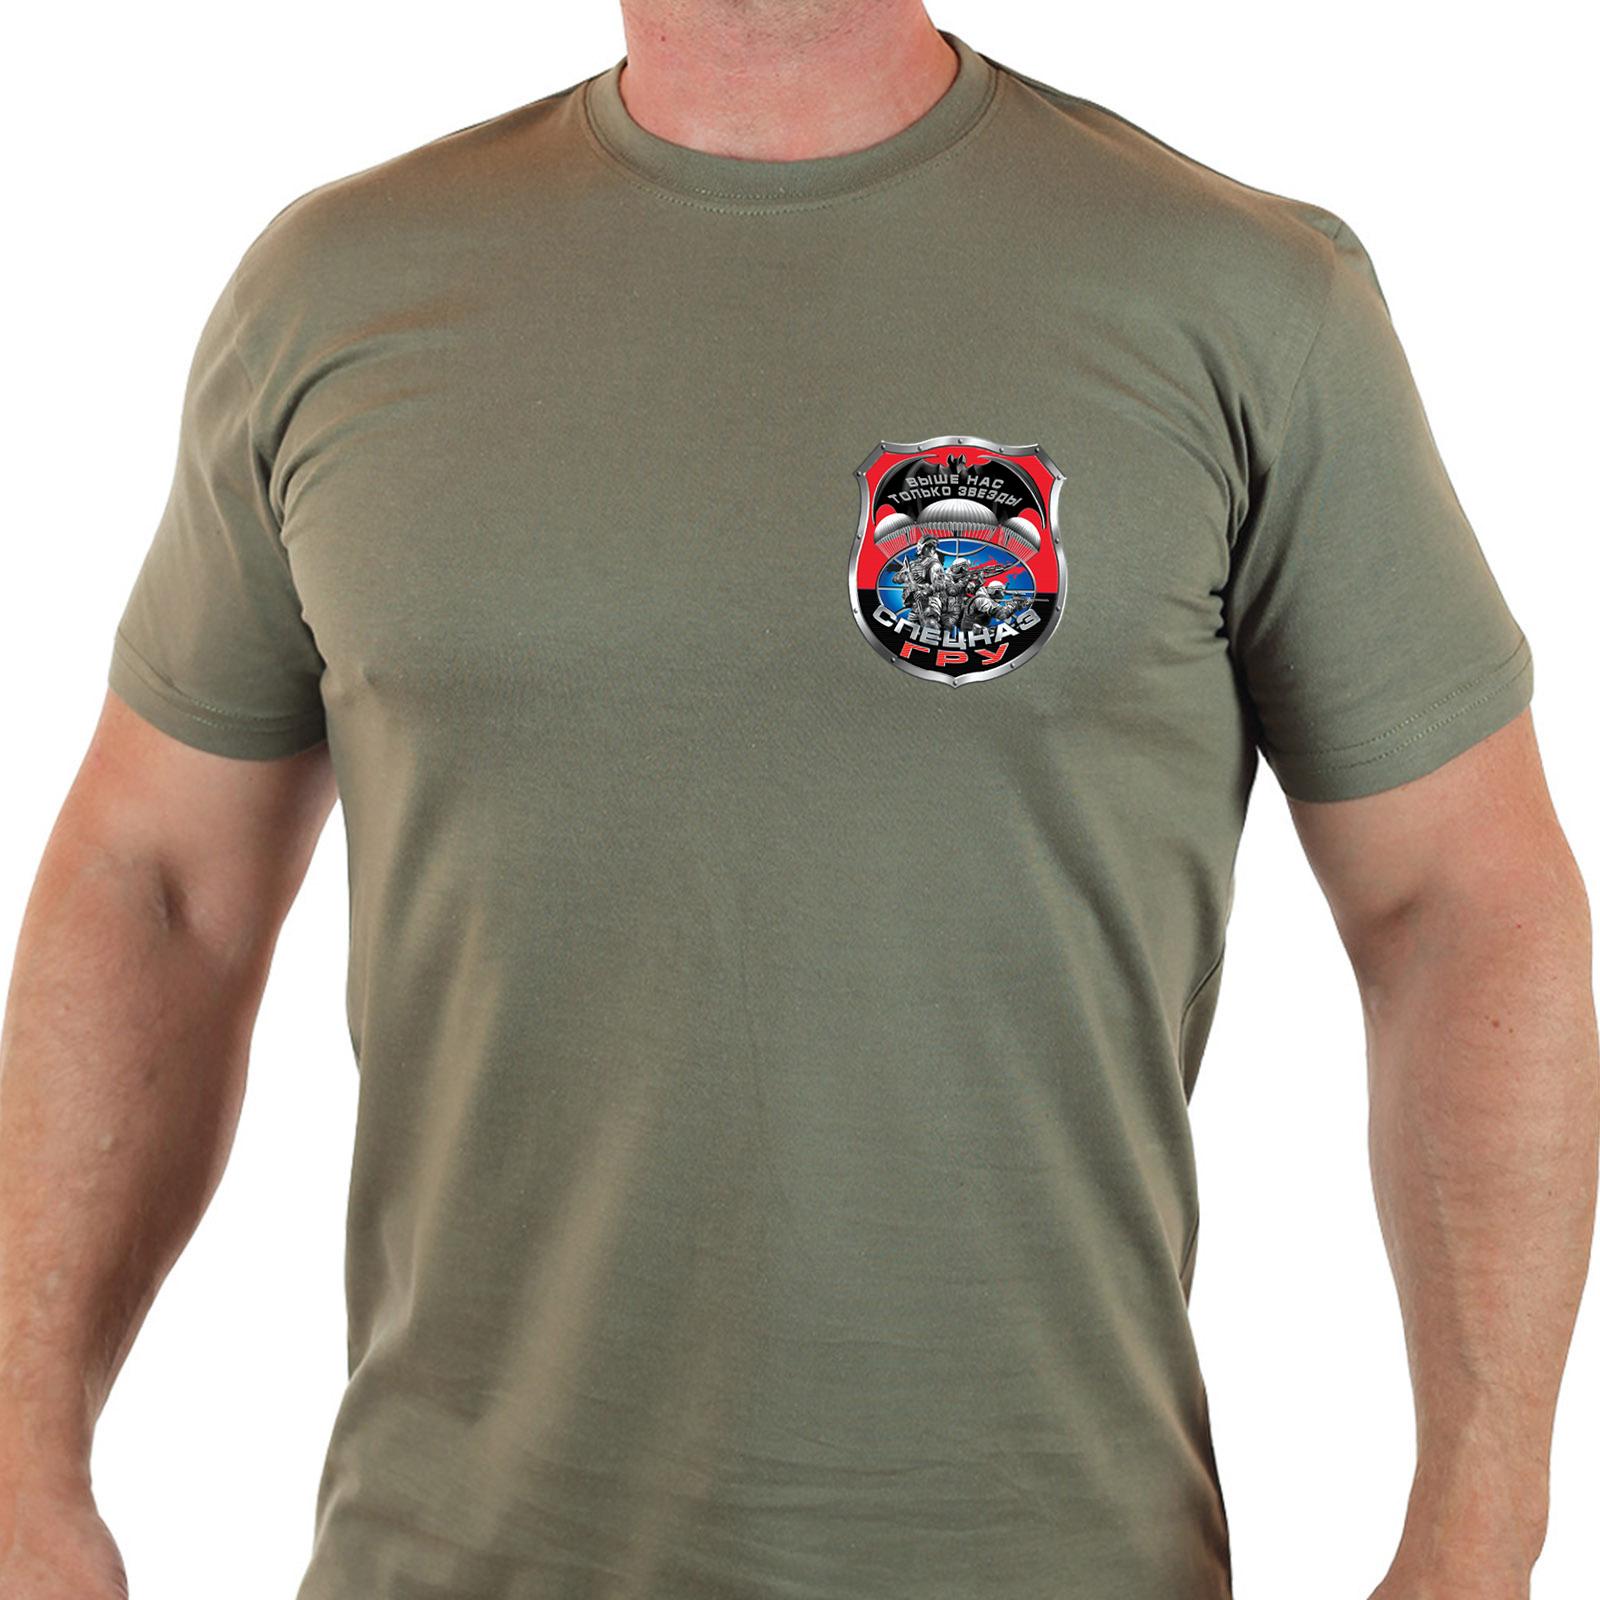 Классная футболка для мужчин с нашивкой Спецназ ГРУ